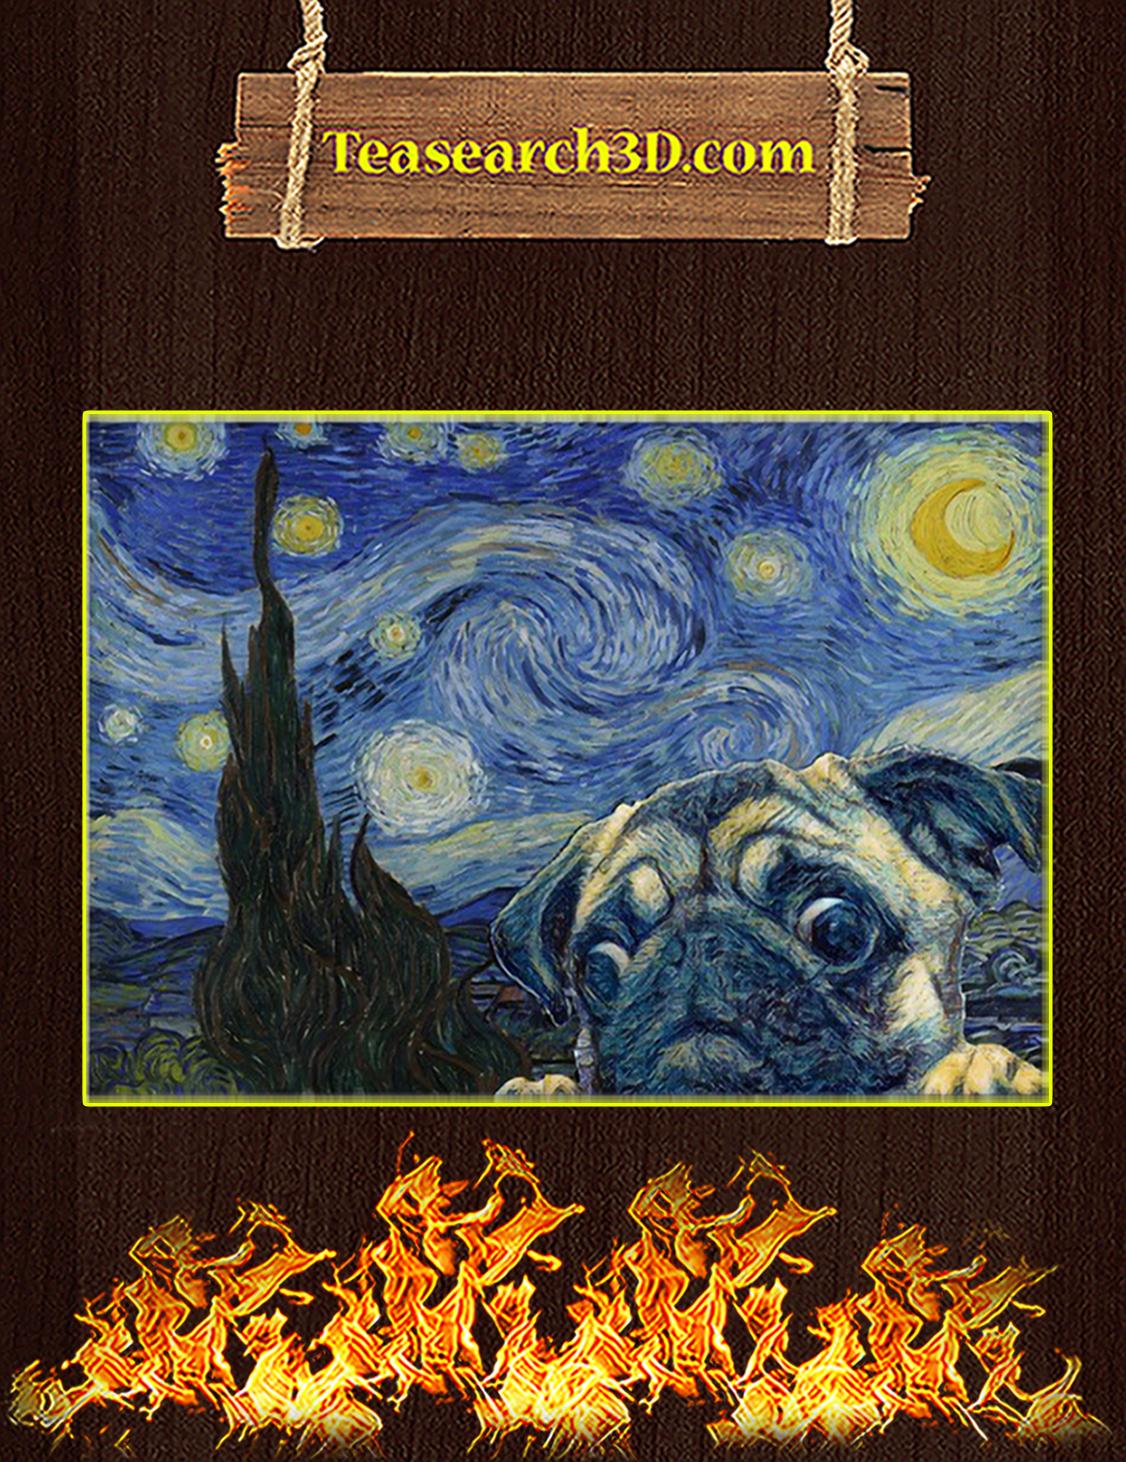 Pug starry night van gogh poster A3